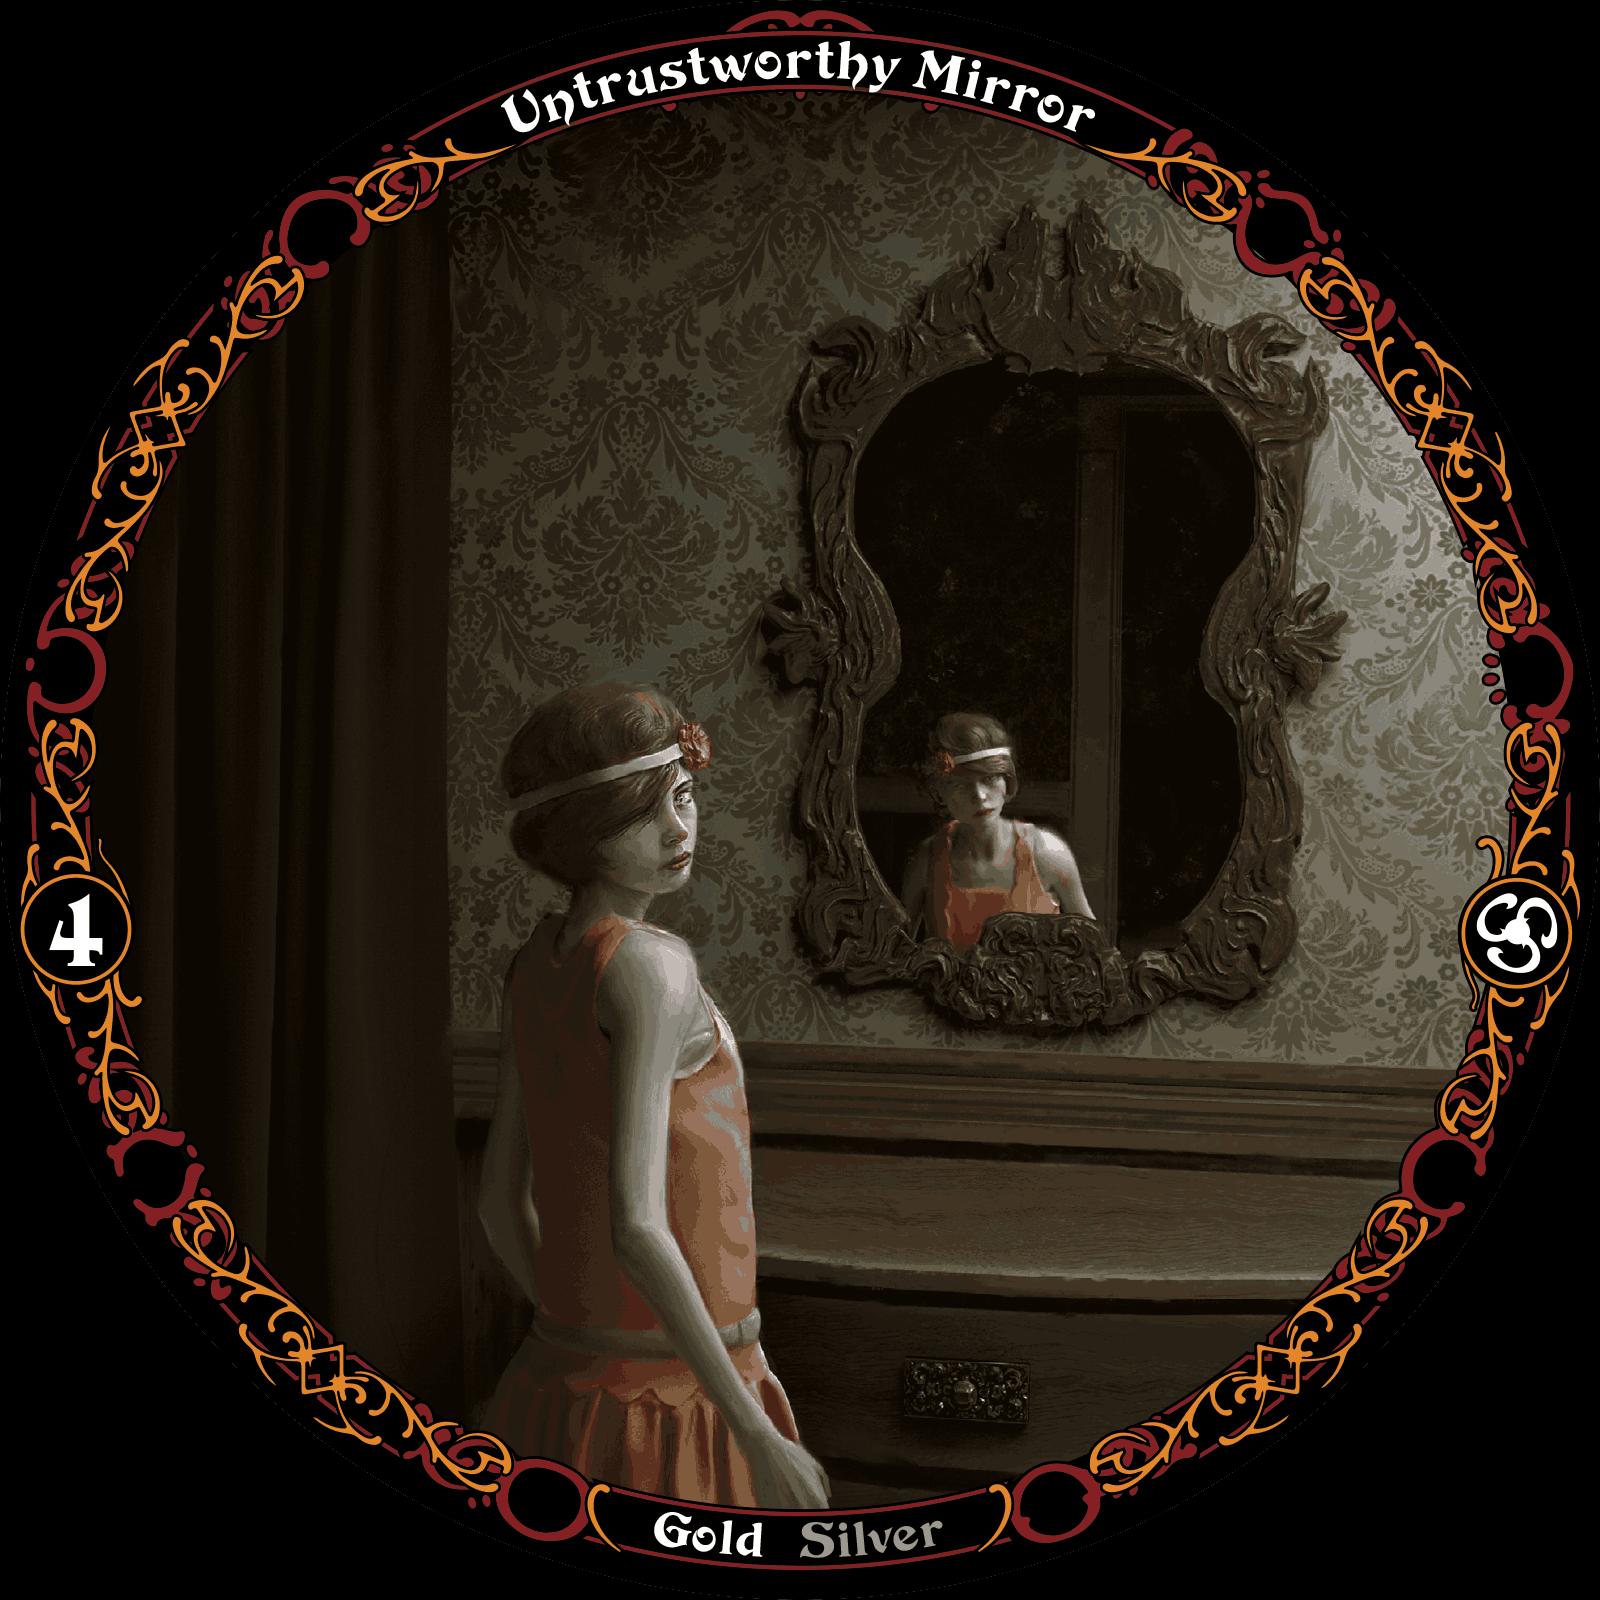 Untrustworthy Mirror sooth card